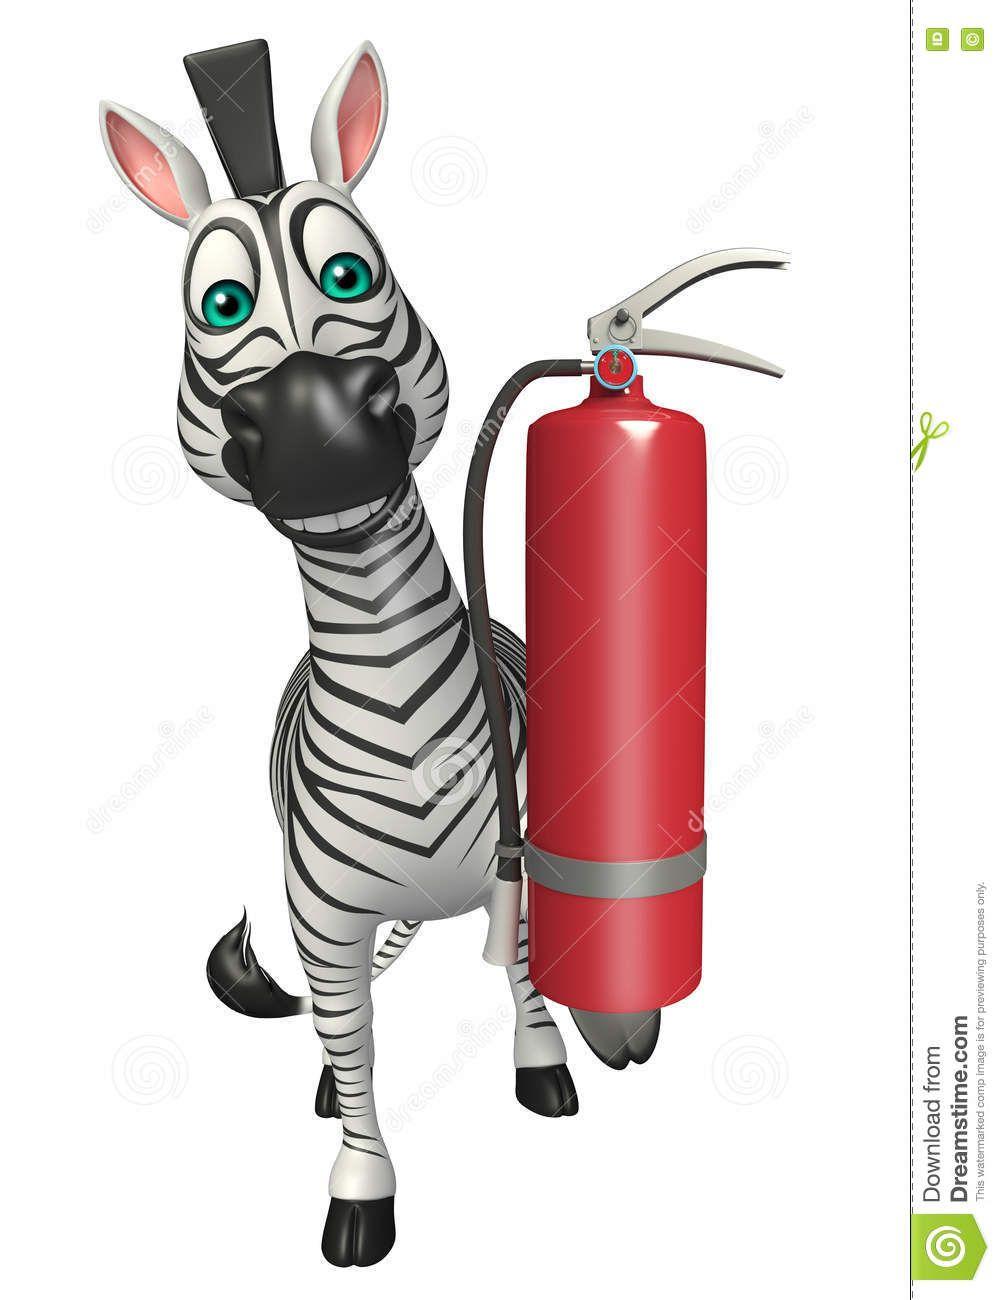 Personaje de dibujos animados. Cebra con extintor... | Carro de ...